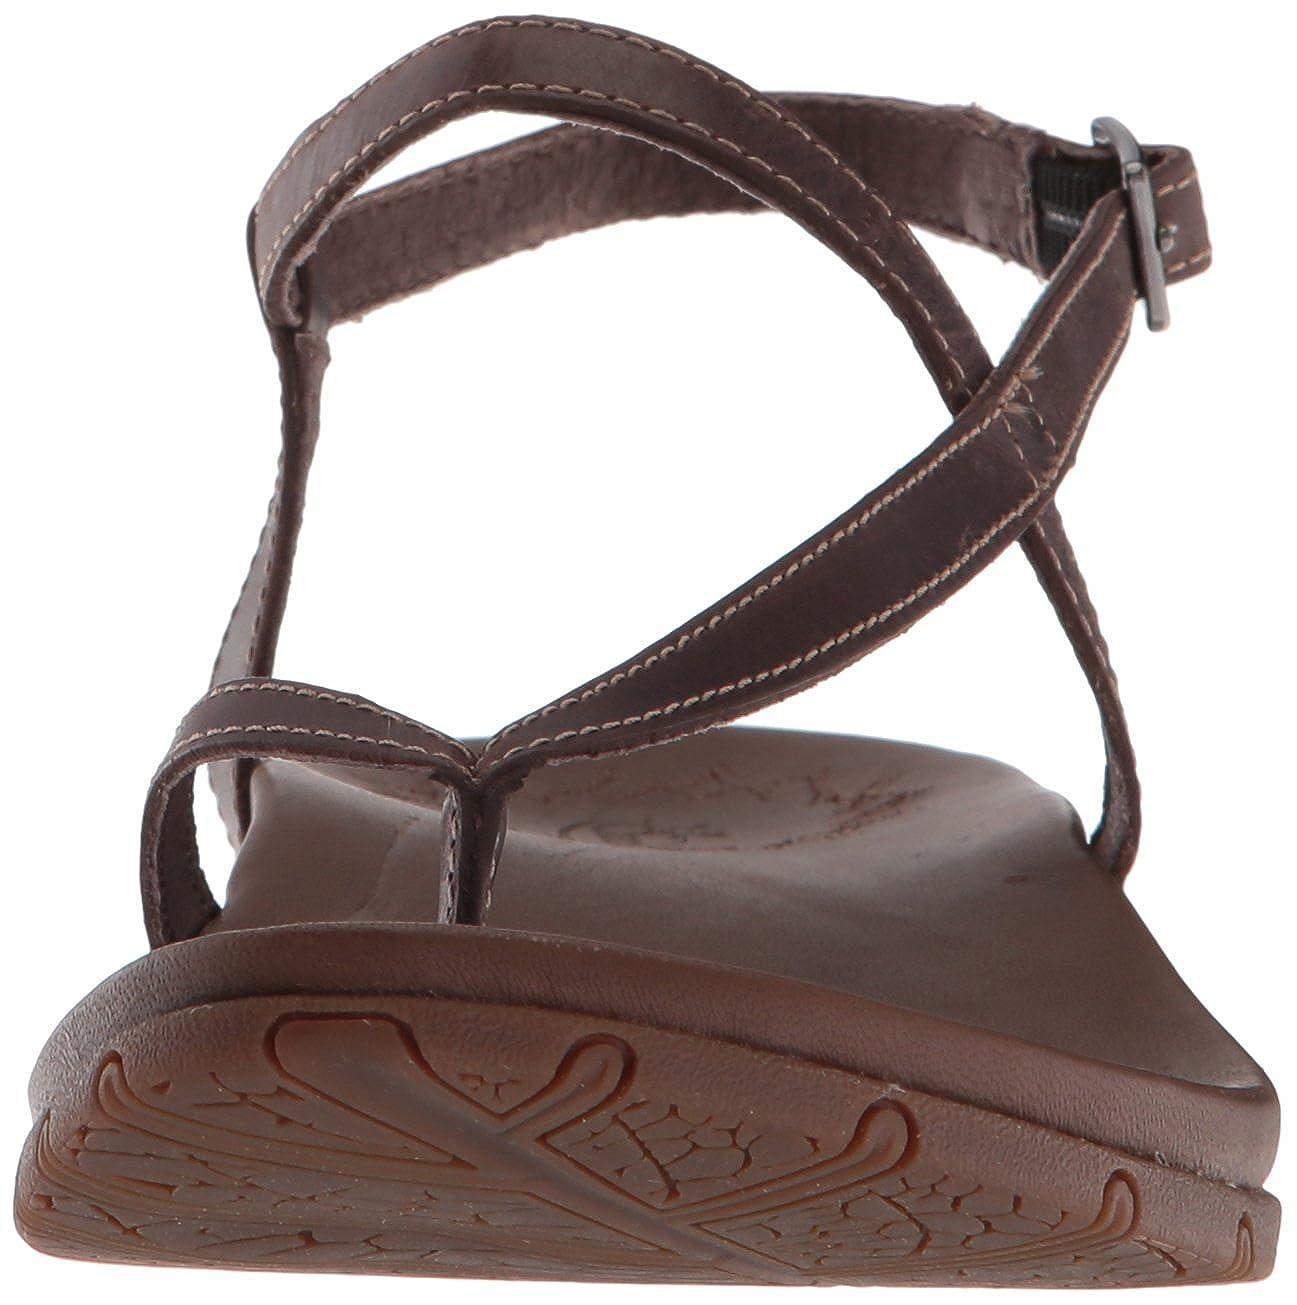 b31a0ff440af Amazon.com  Chaco Women s Rowan Sandal  Shoes